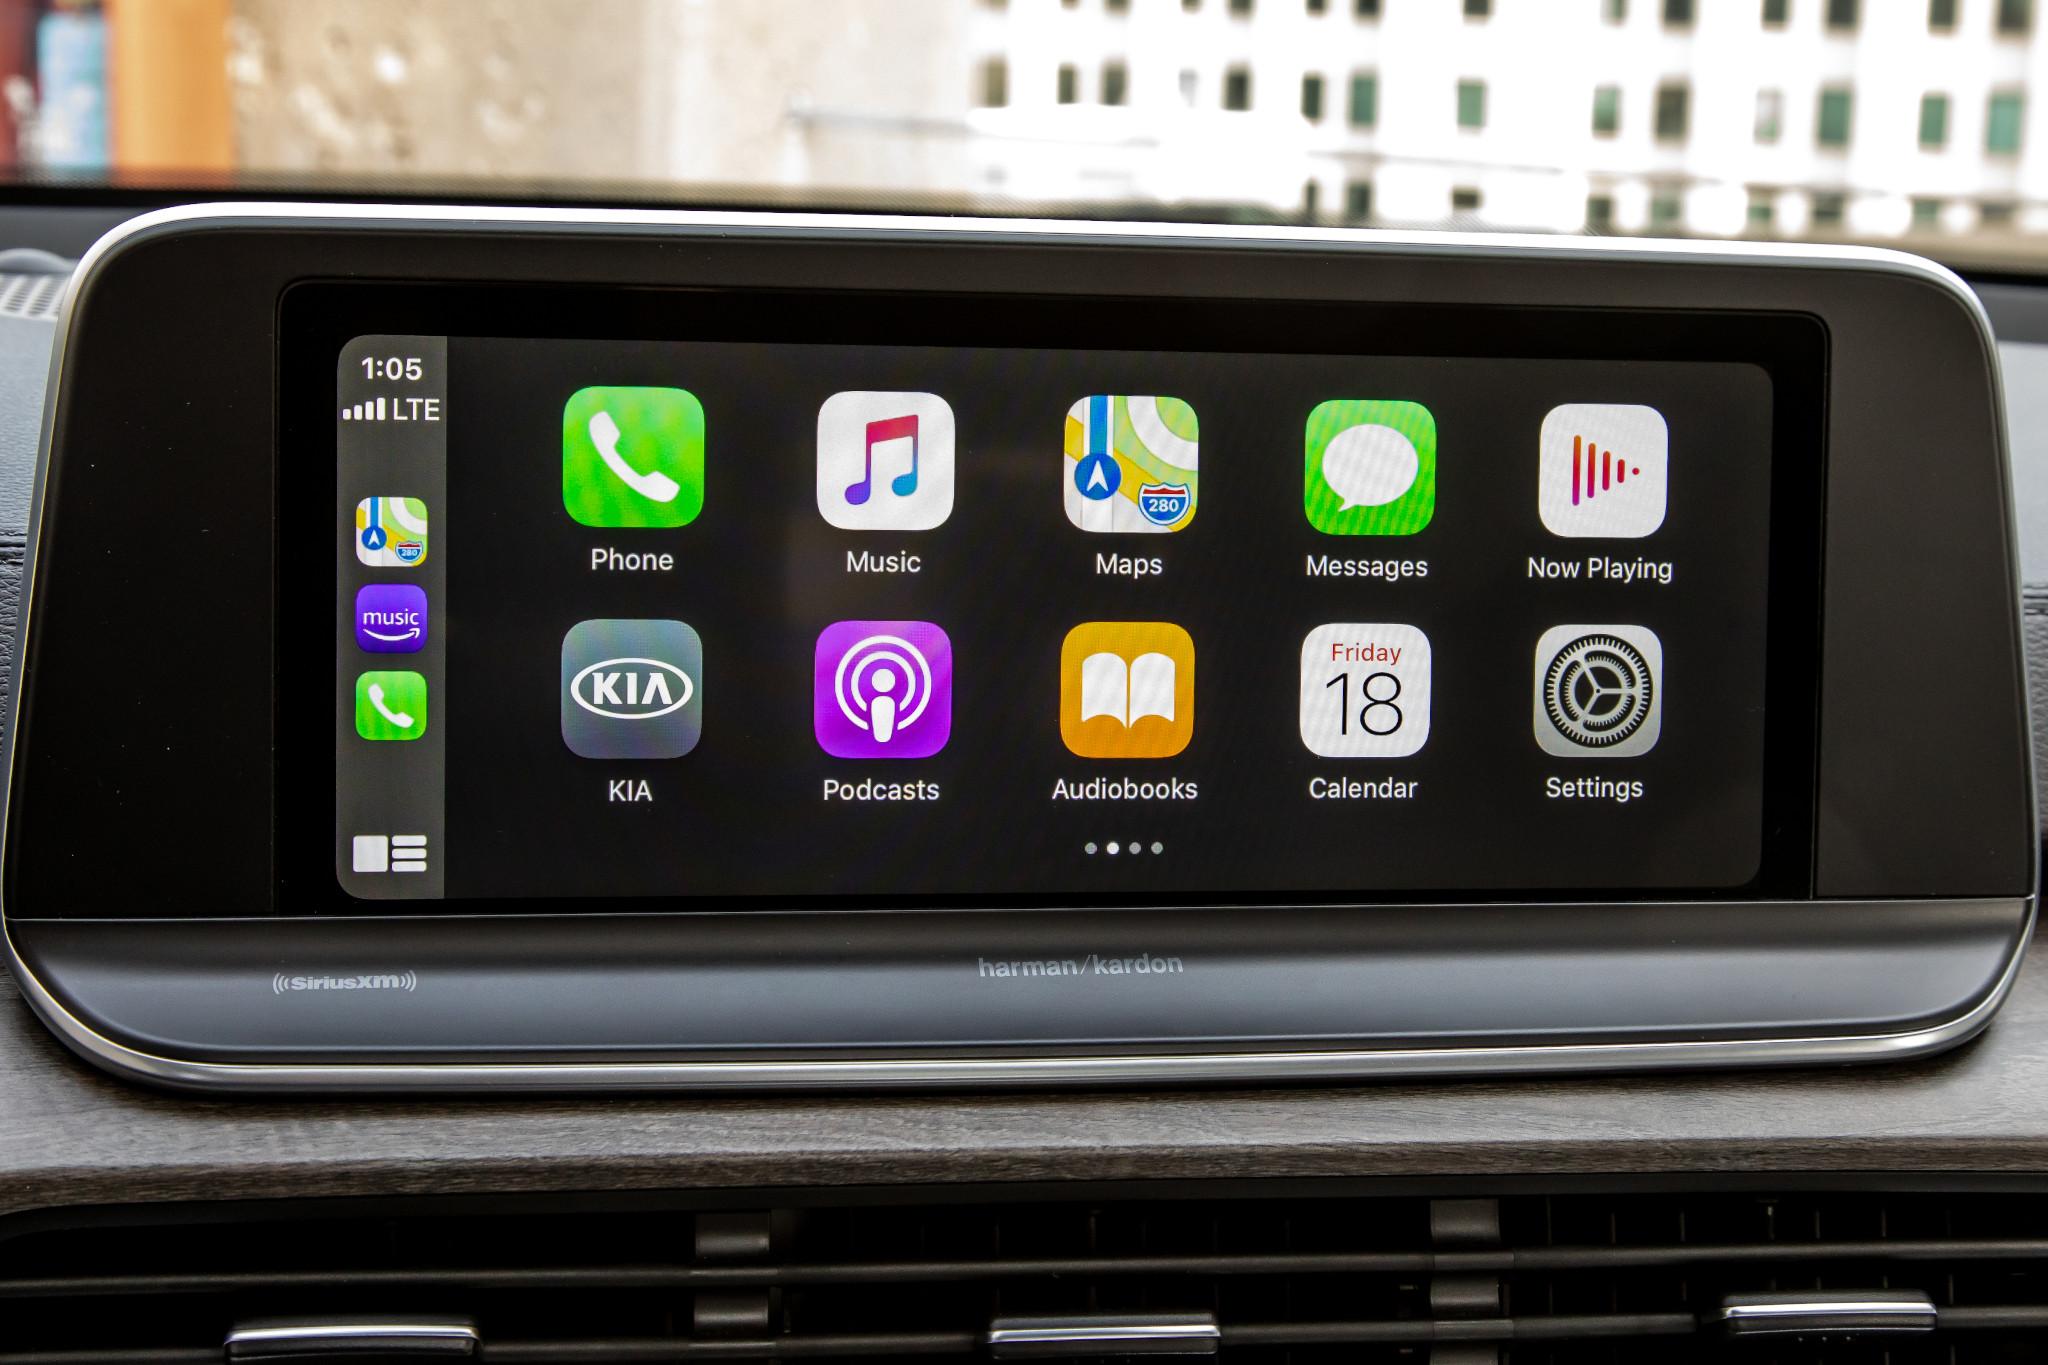 kia-telluride-sx-awd-2020-32-apple-carplay--center-stack-display--front-row--interior.jpg